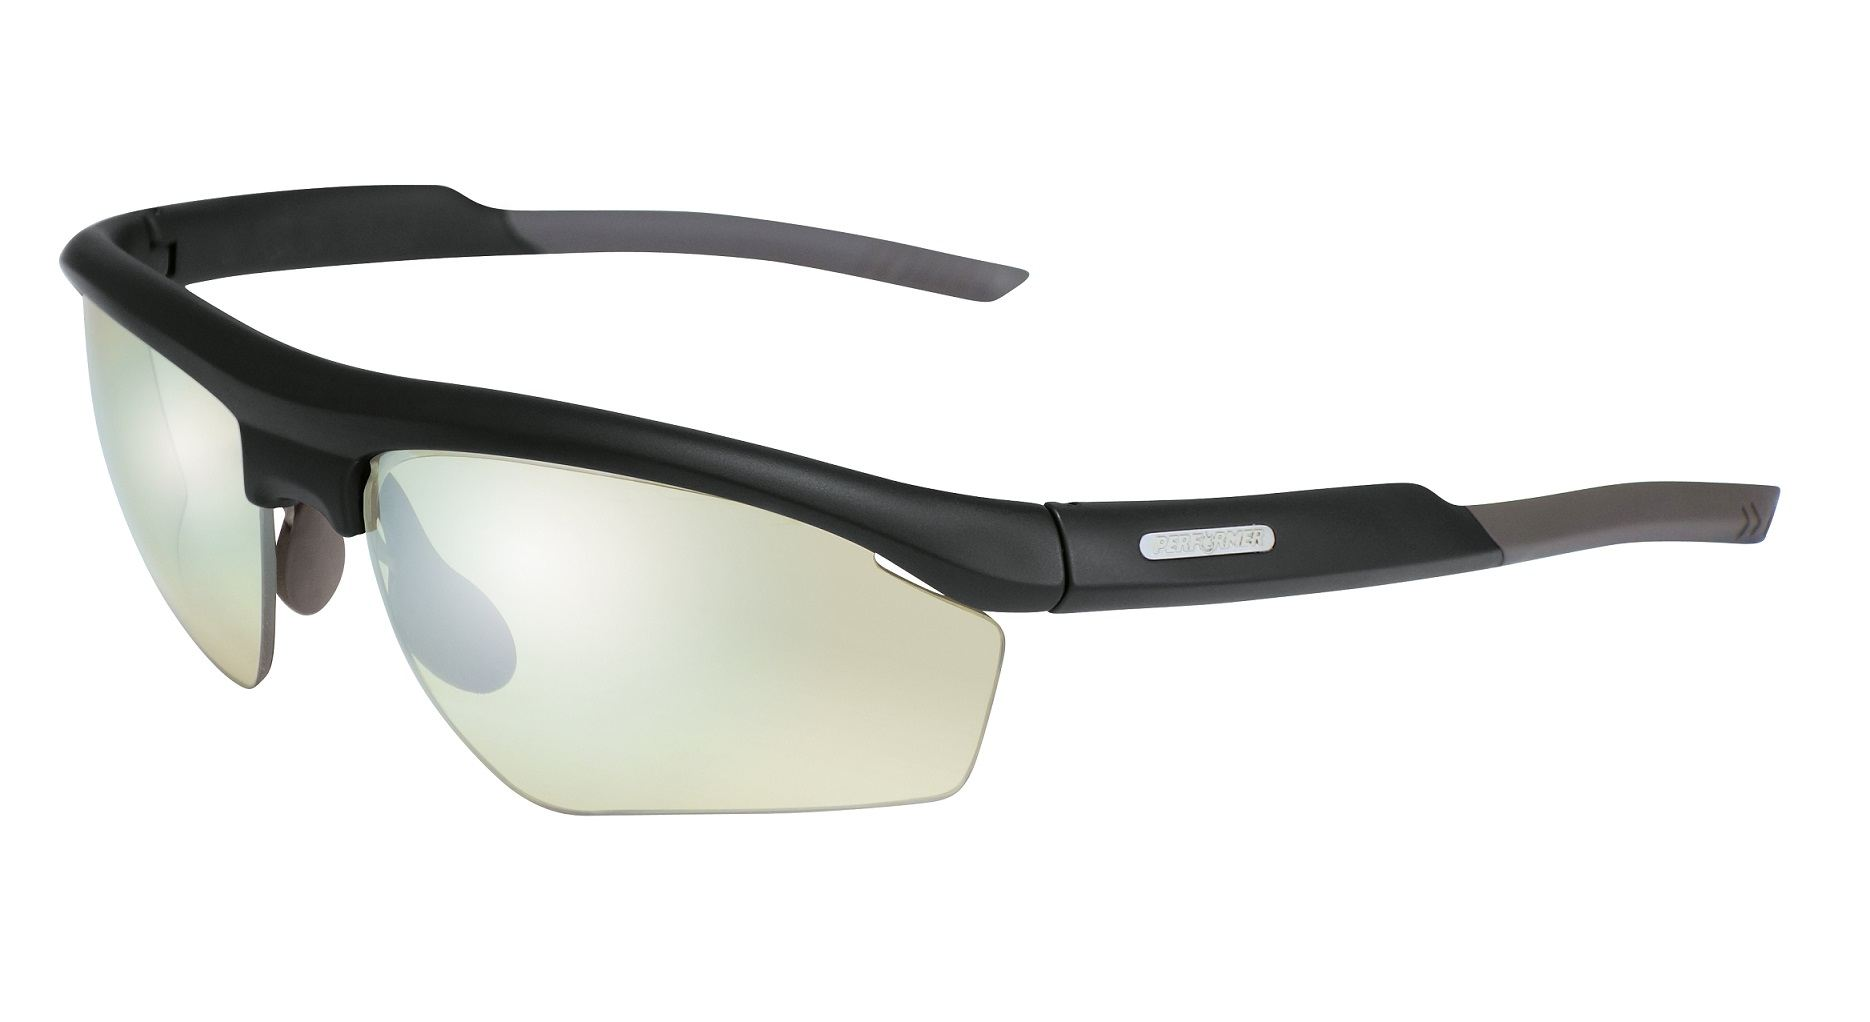 Performer Modell TTR 2.0 200 Sportbrille, Bikerbrille, Sonnenbrille.